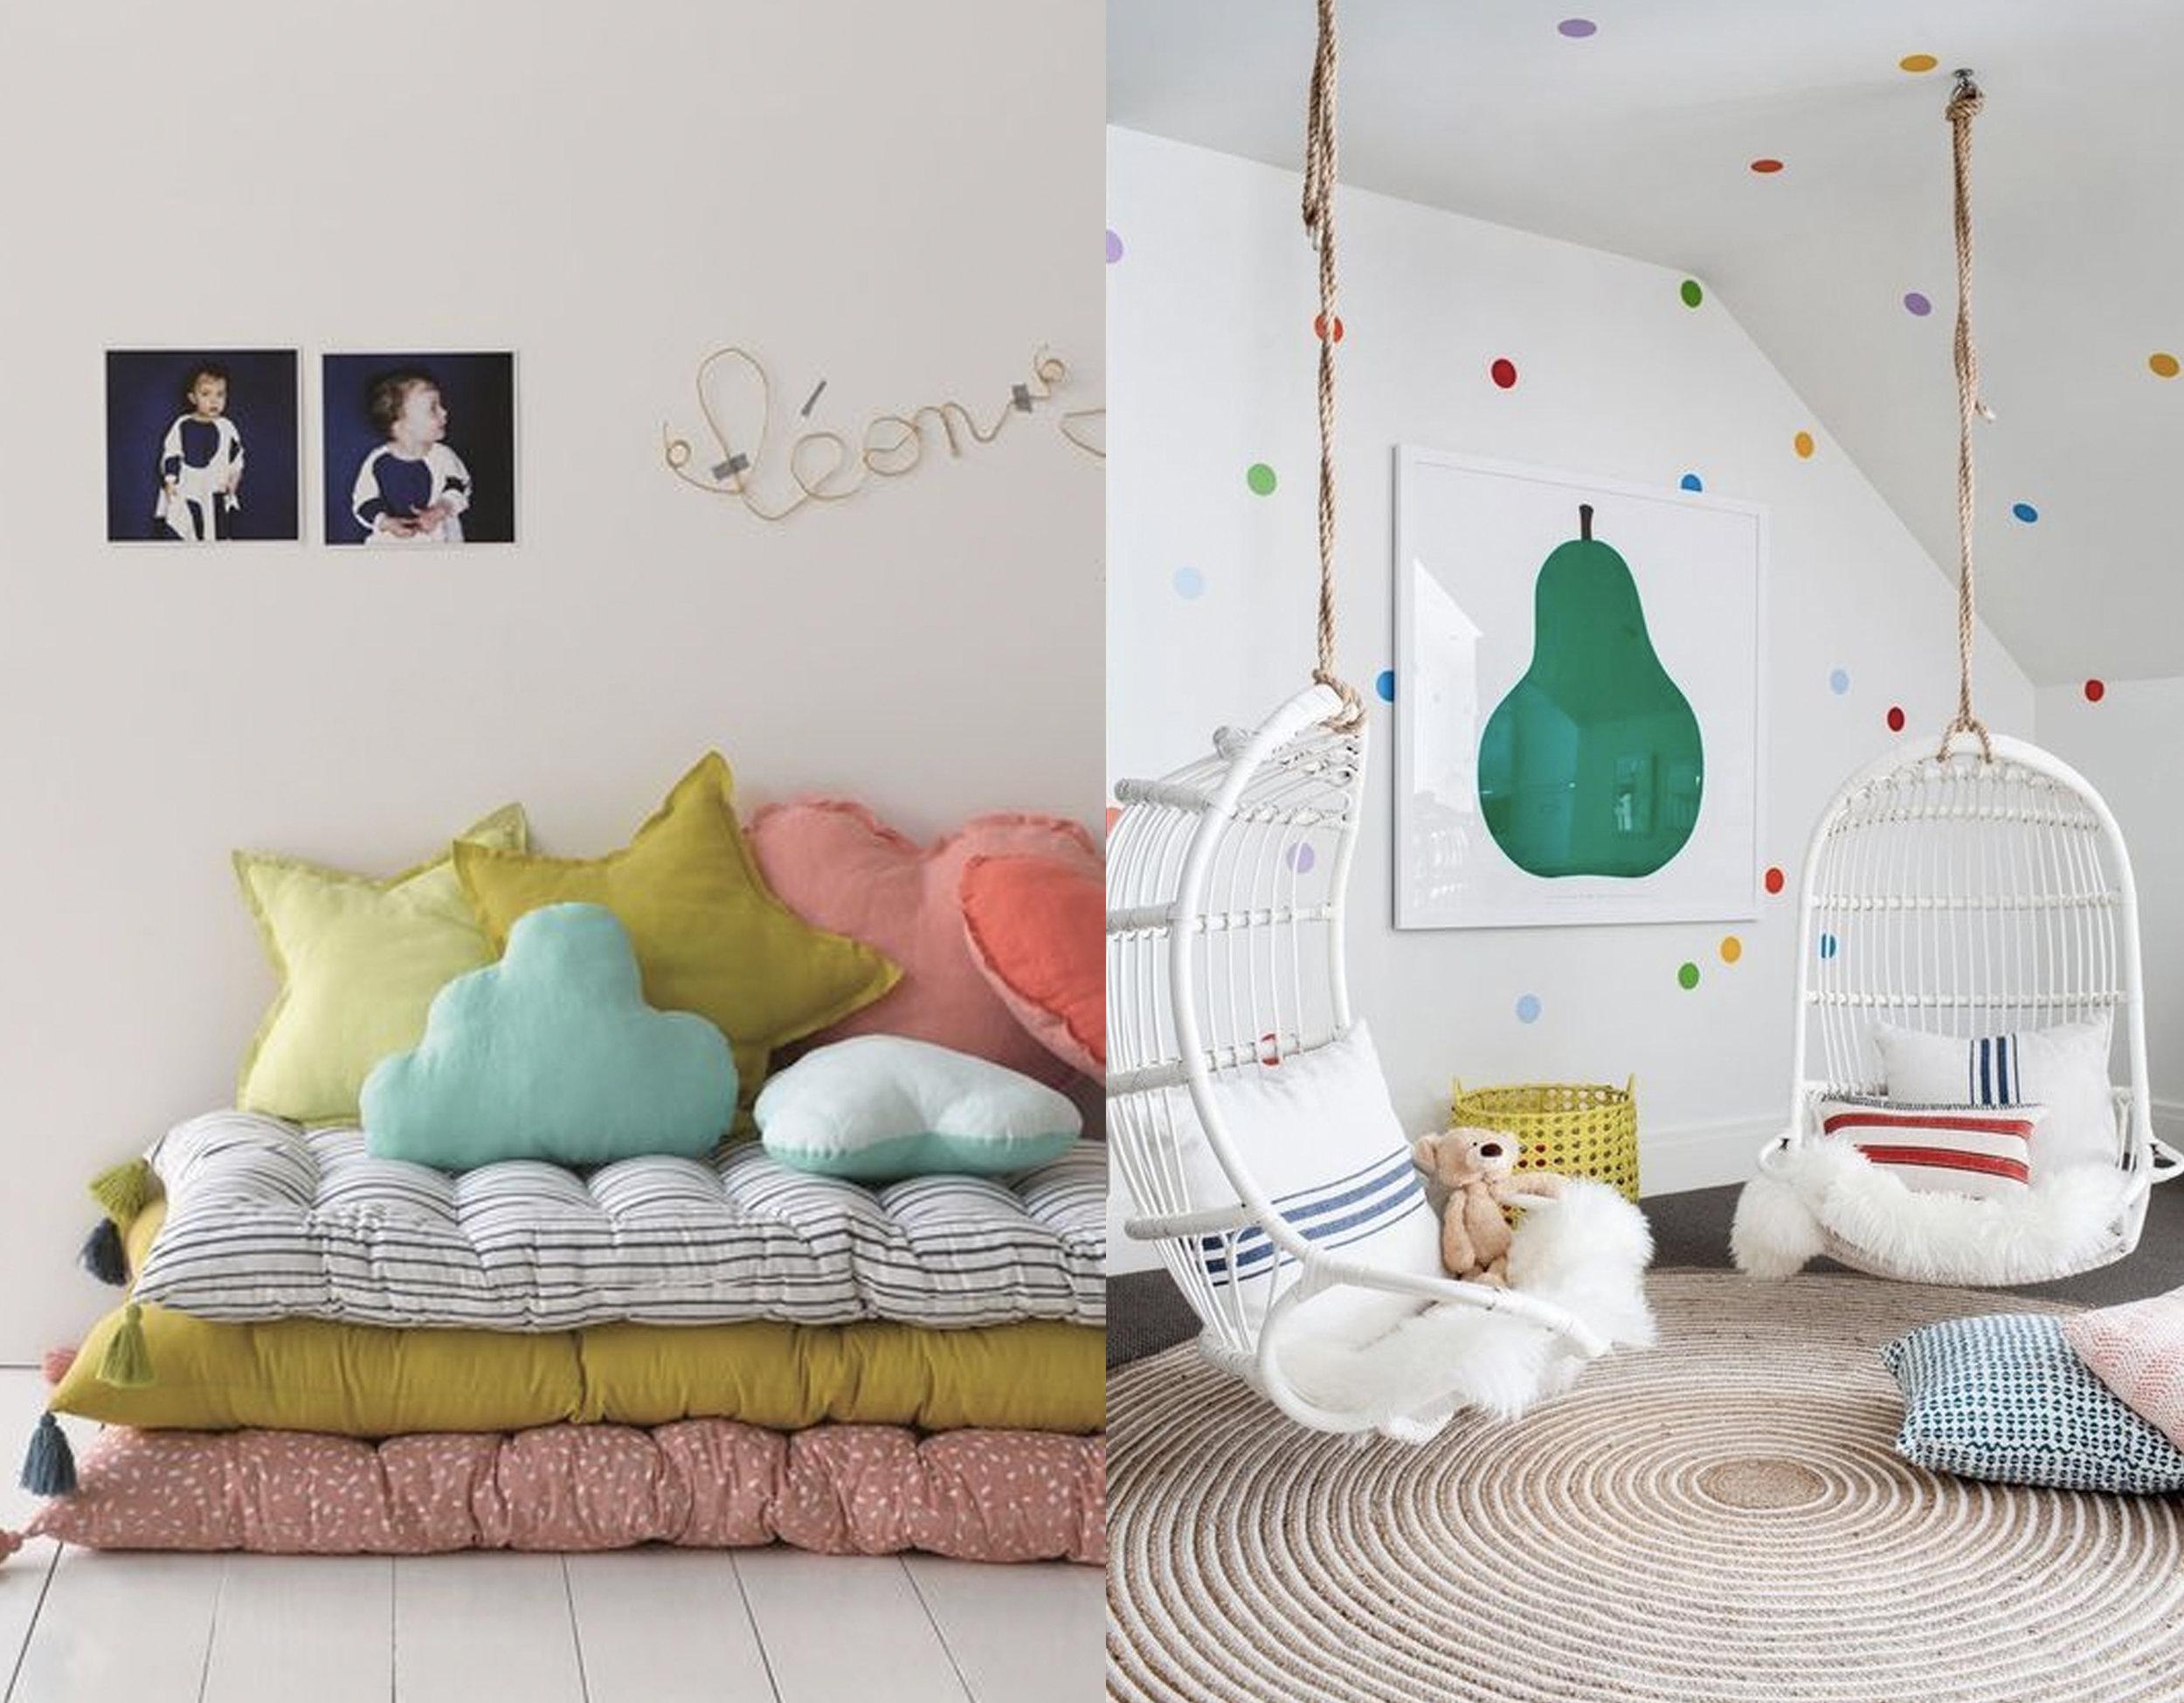 pile of mattresses via  Exclusive Bedlinen  - reading corner via  Interior Design Up